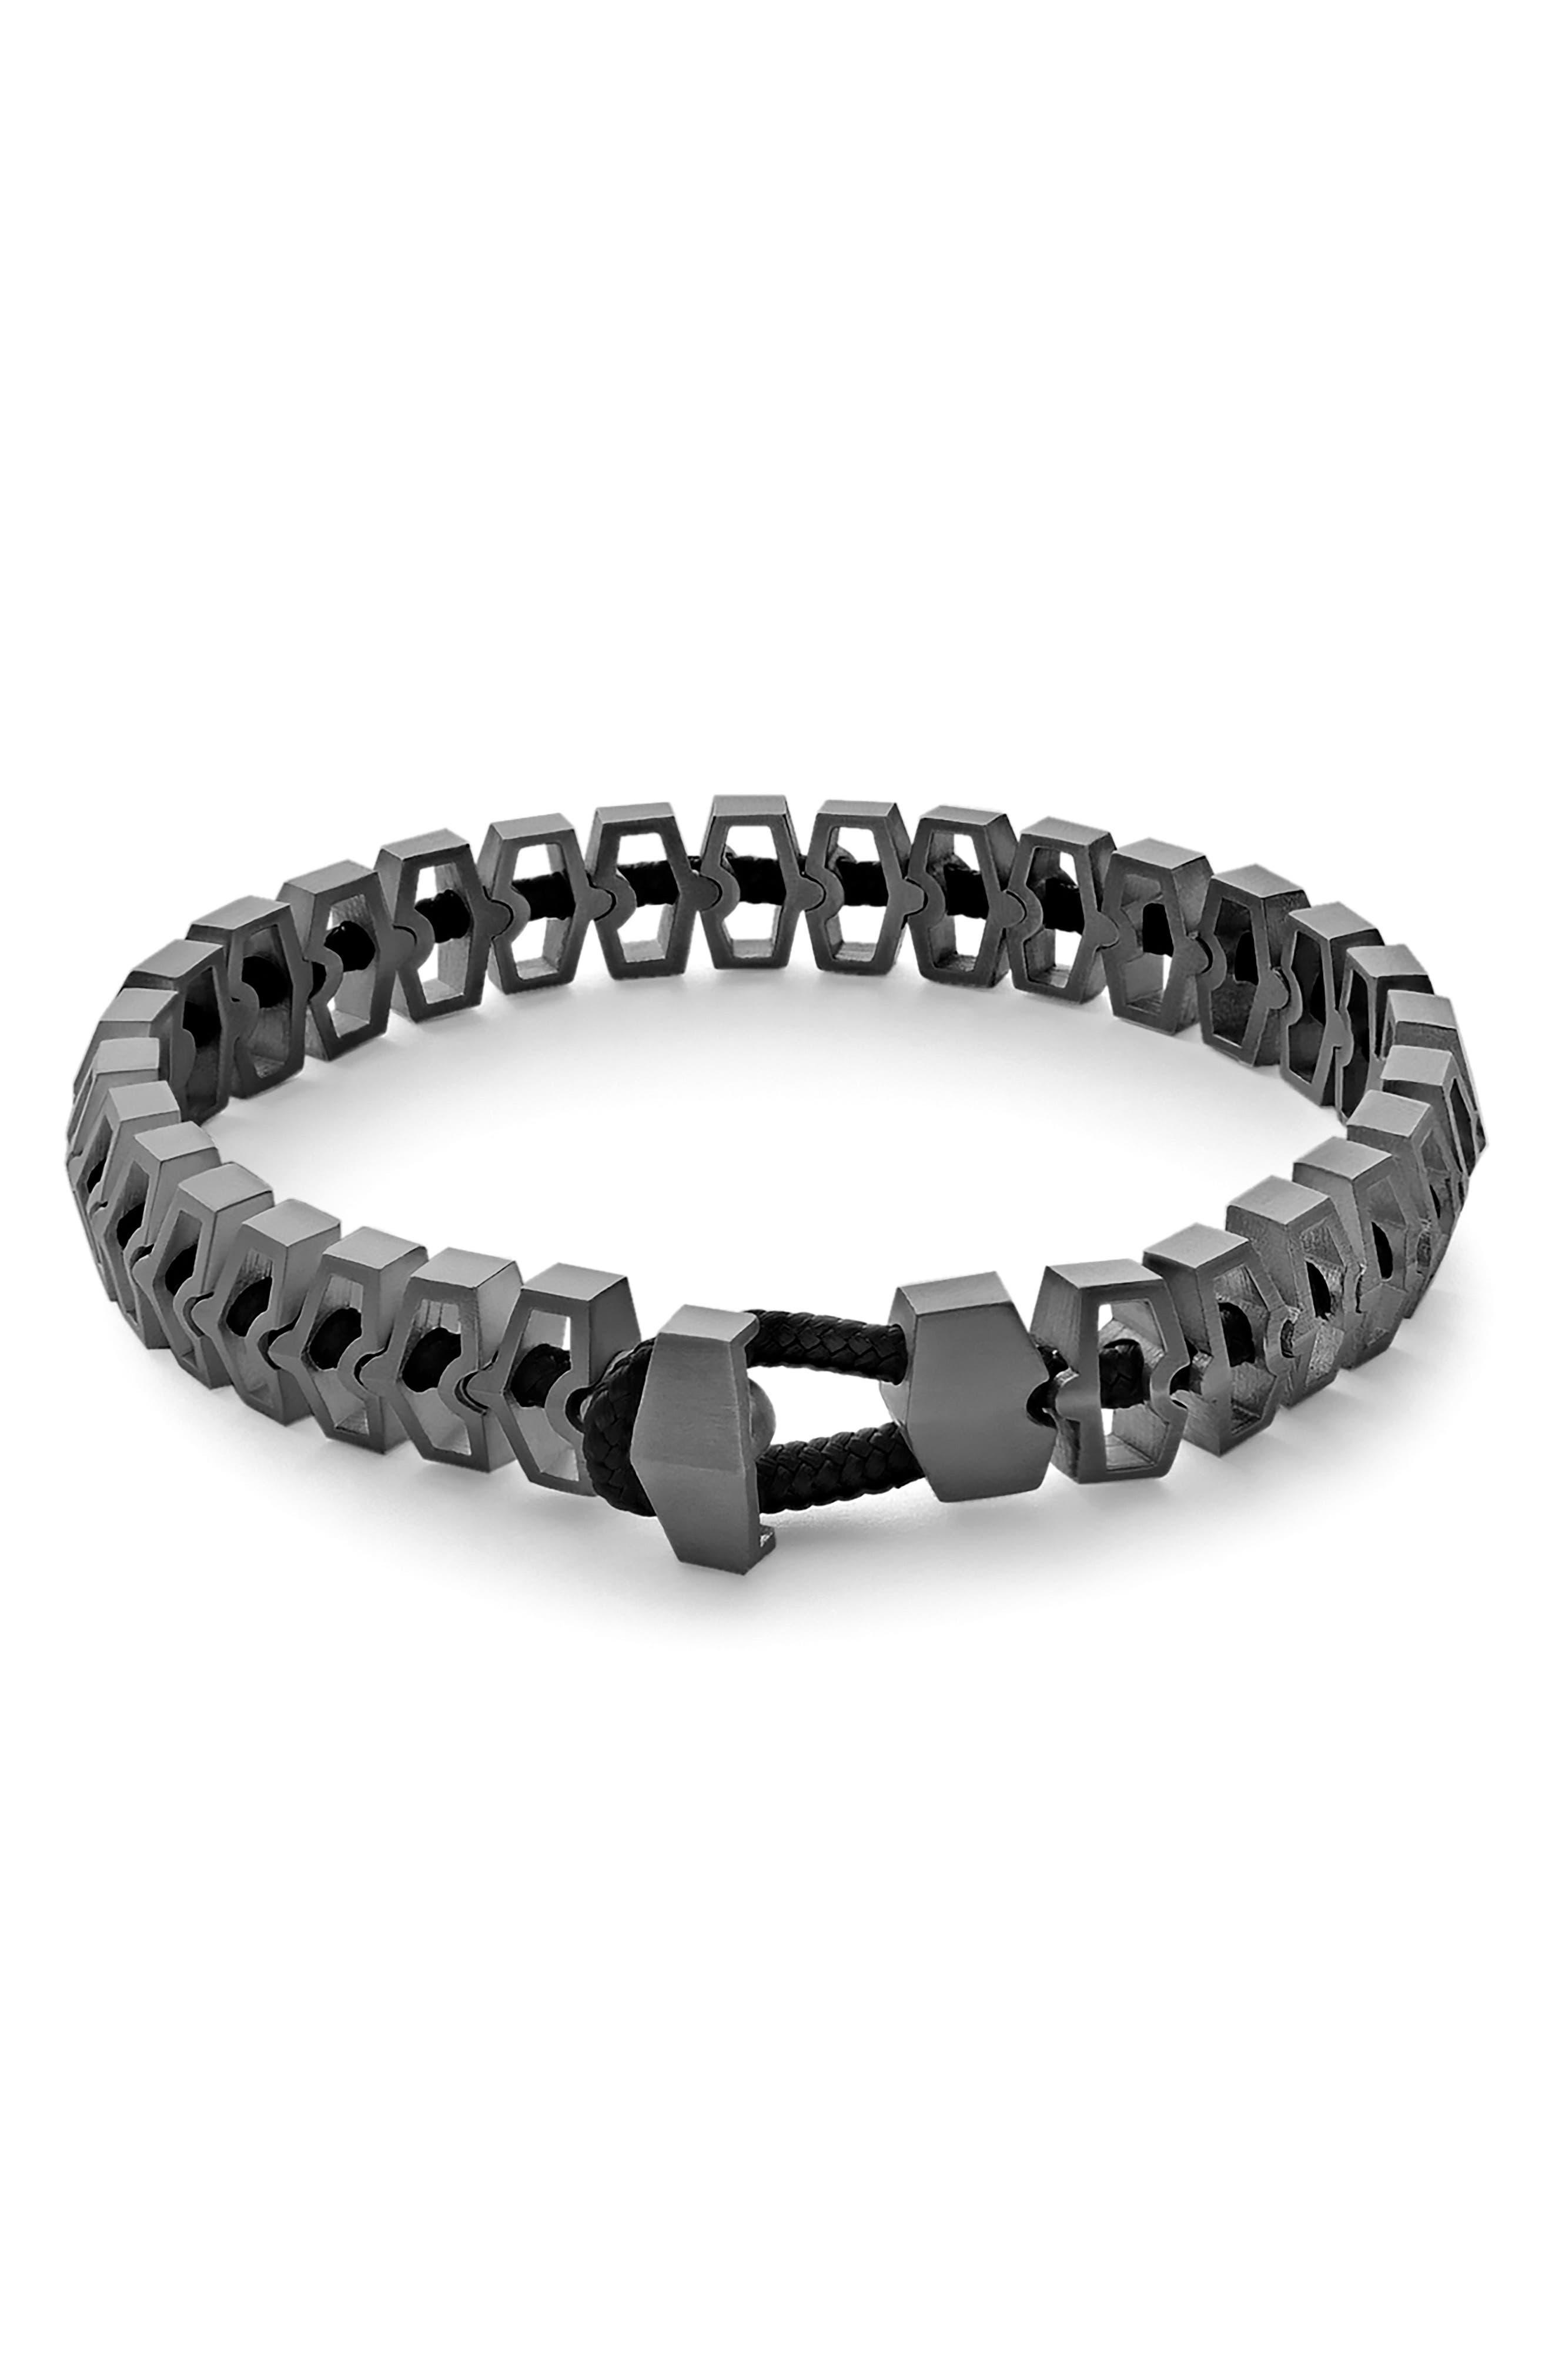 Harbour Bracelet,                         Main,                         color, SOLID BLACK